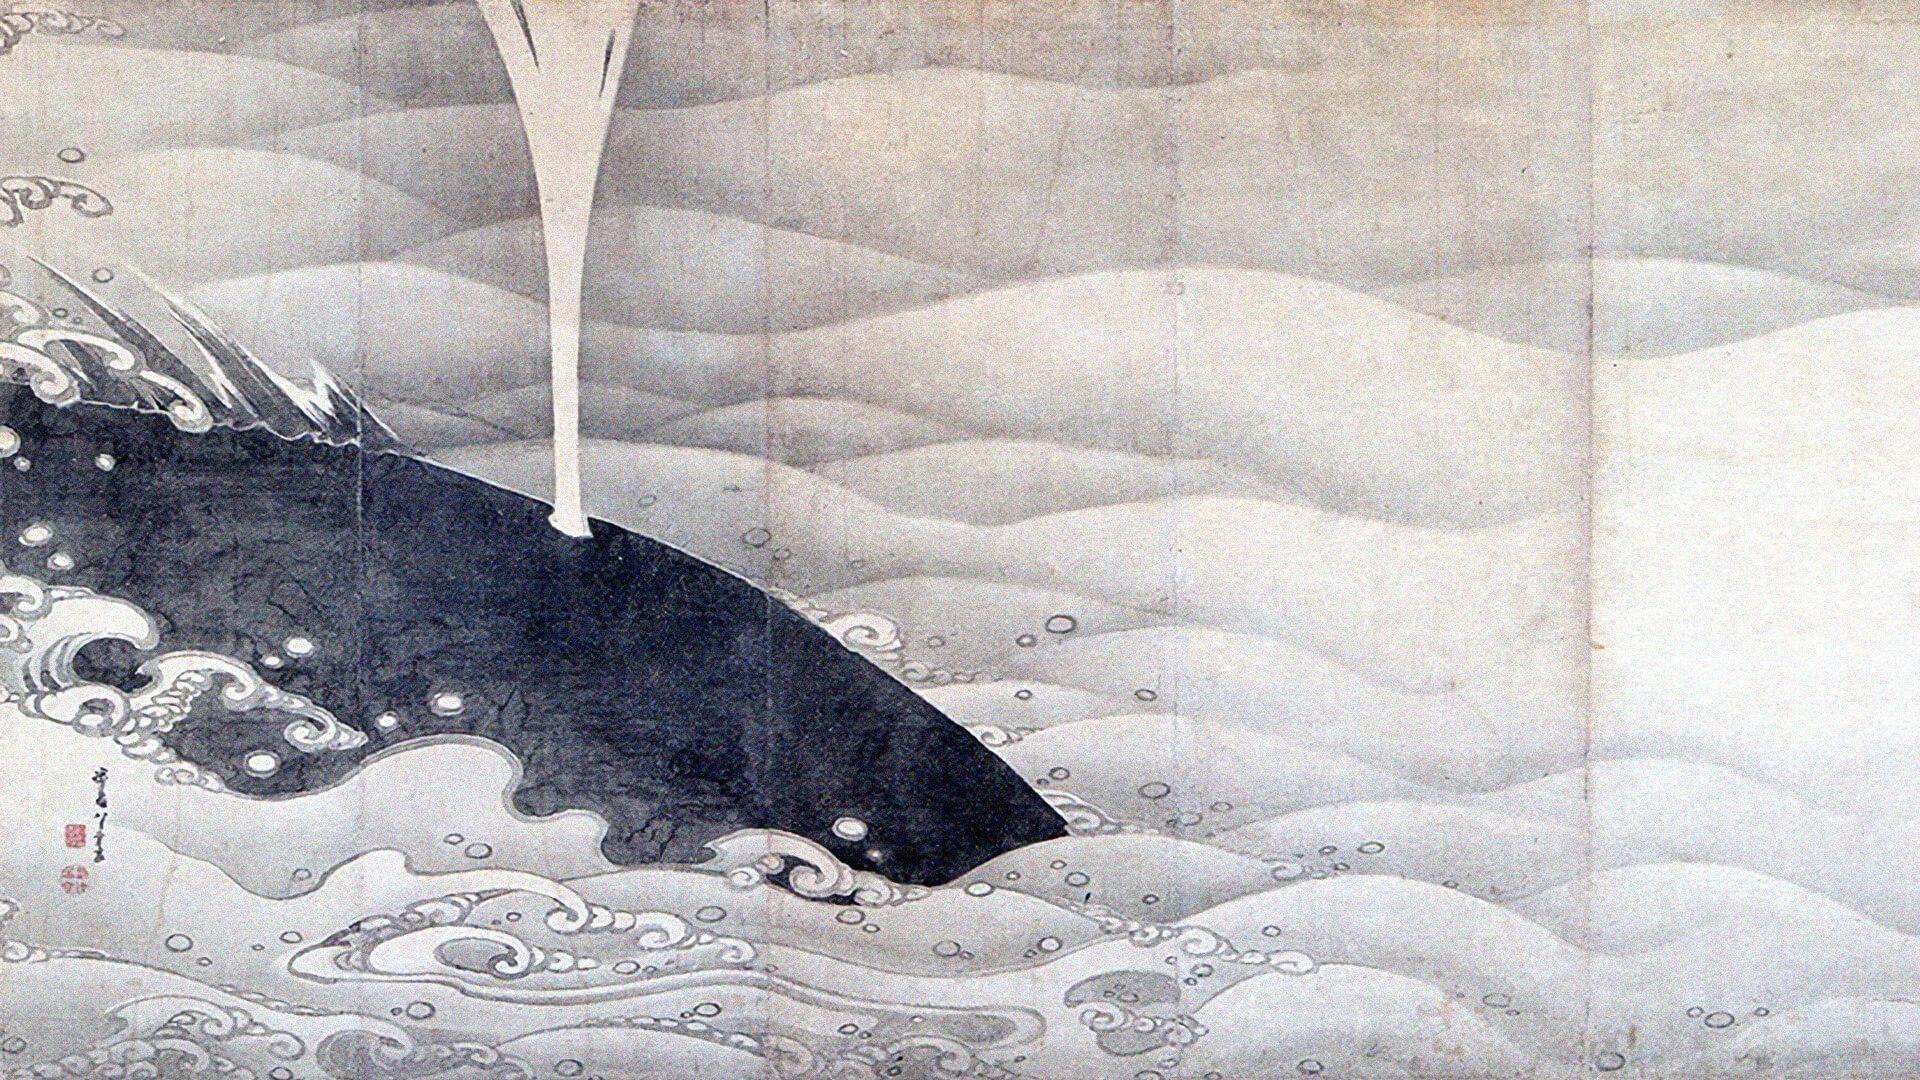 伊藤若冲 ito jyakuchu / 象と鯨図屏風(鯨)